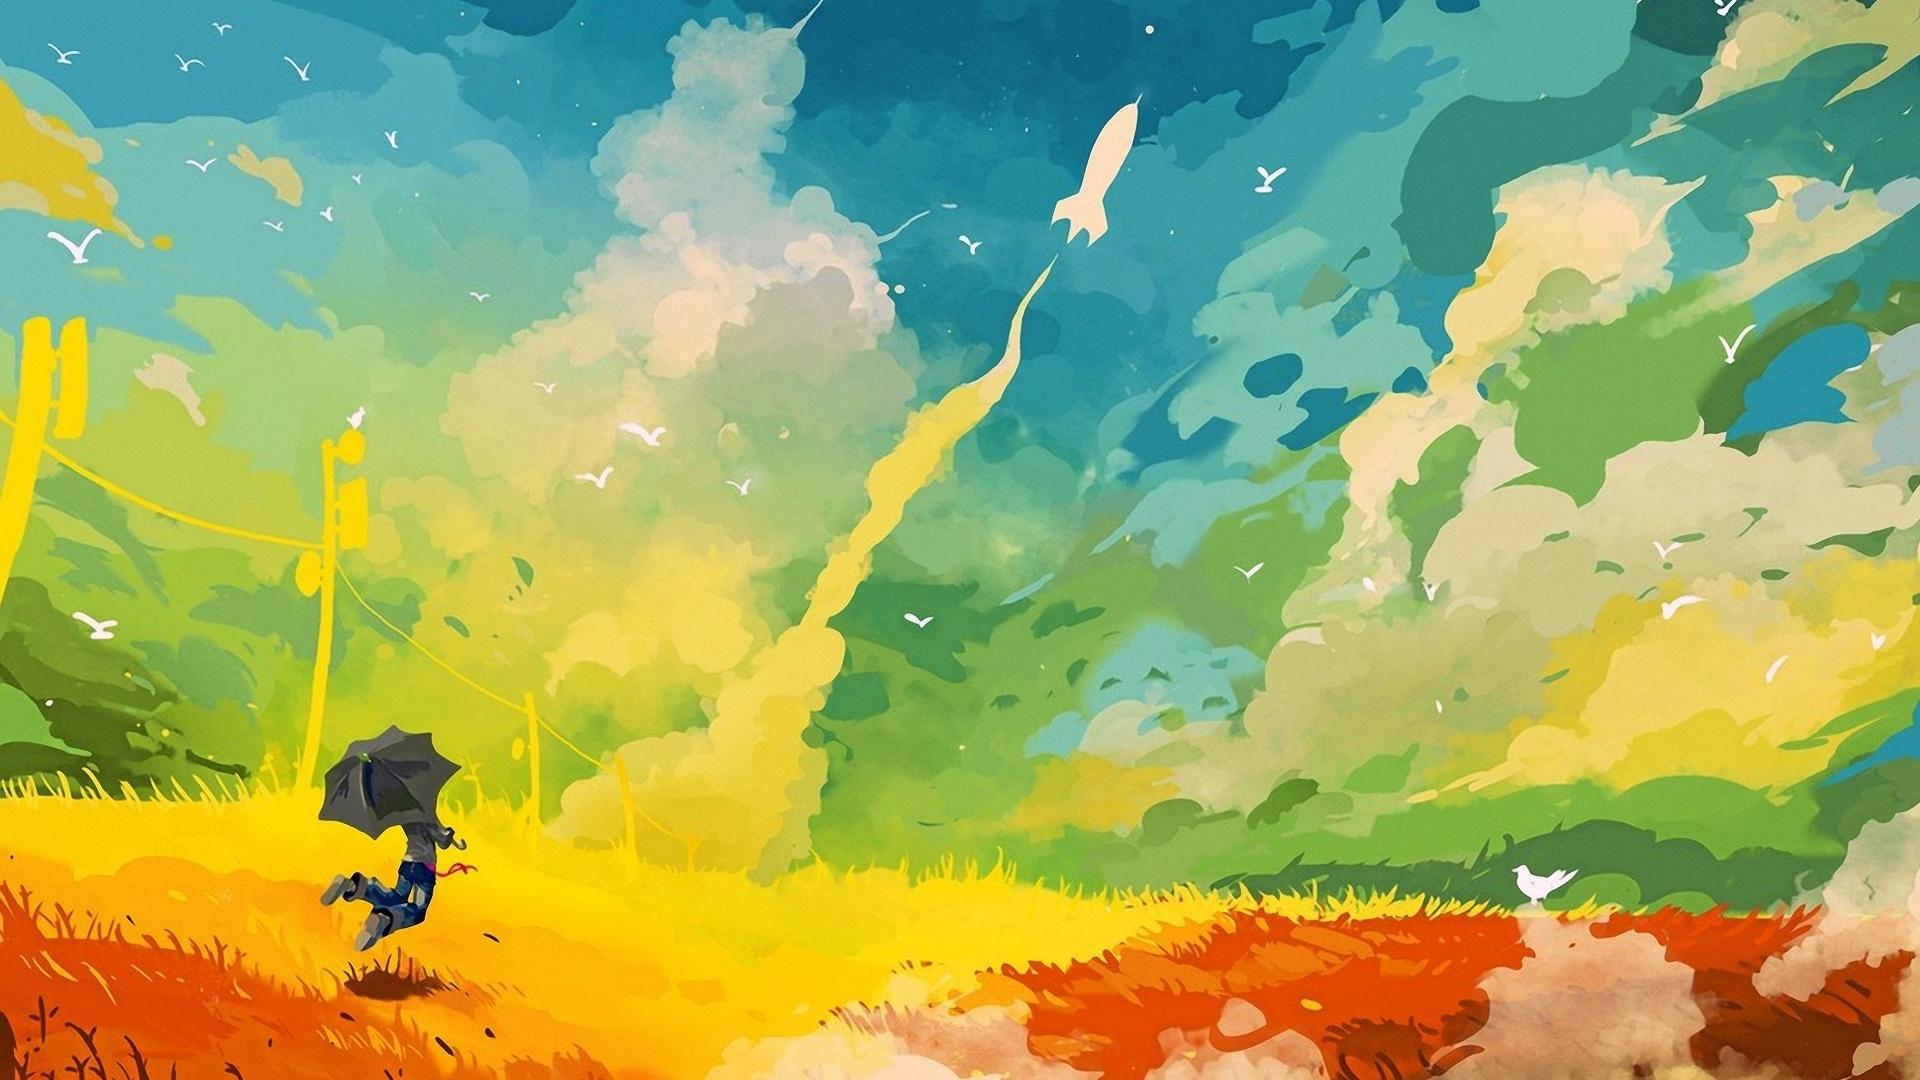 abstract art wallpaper hd images desktop full windows backgrounds